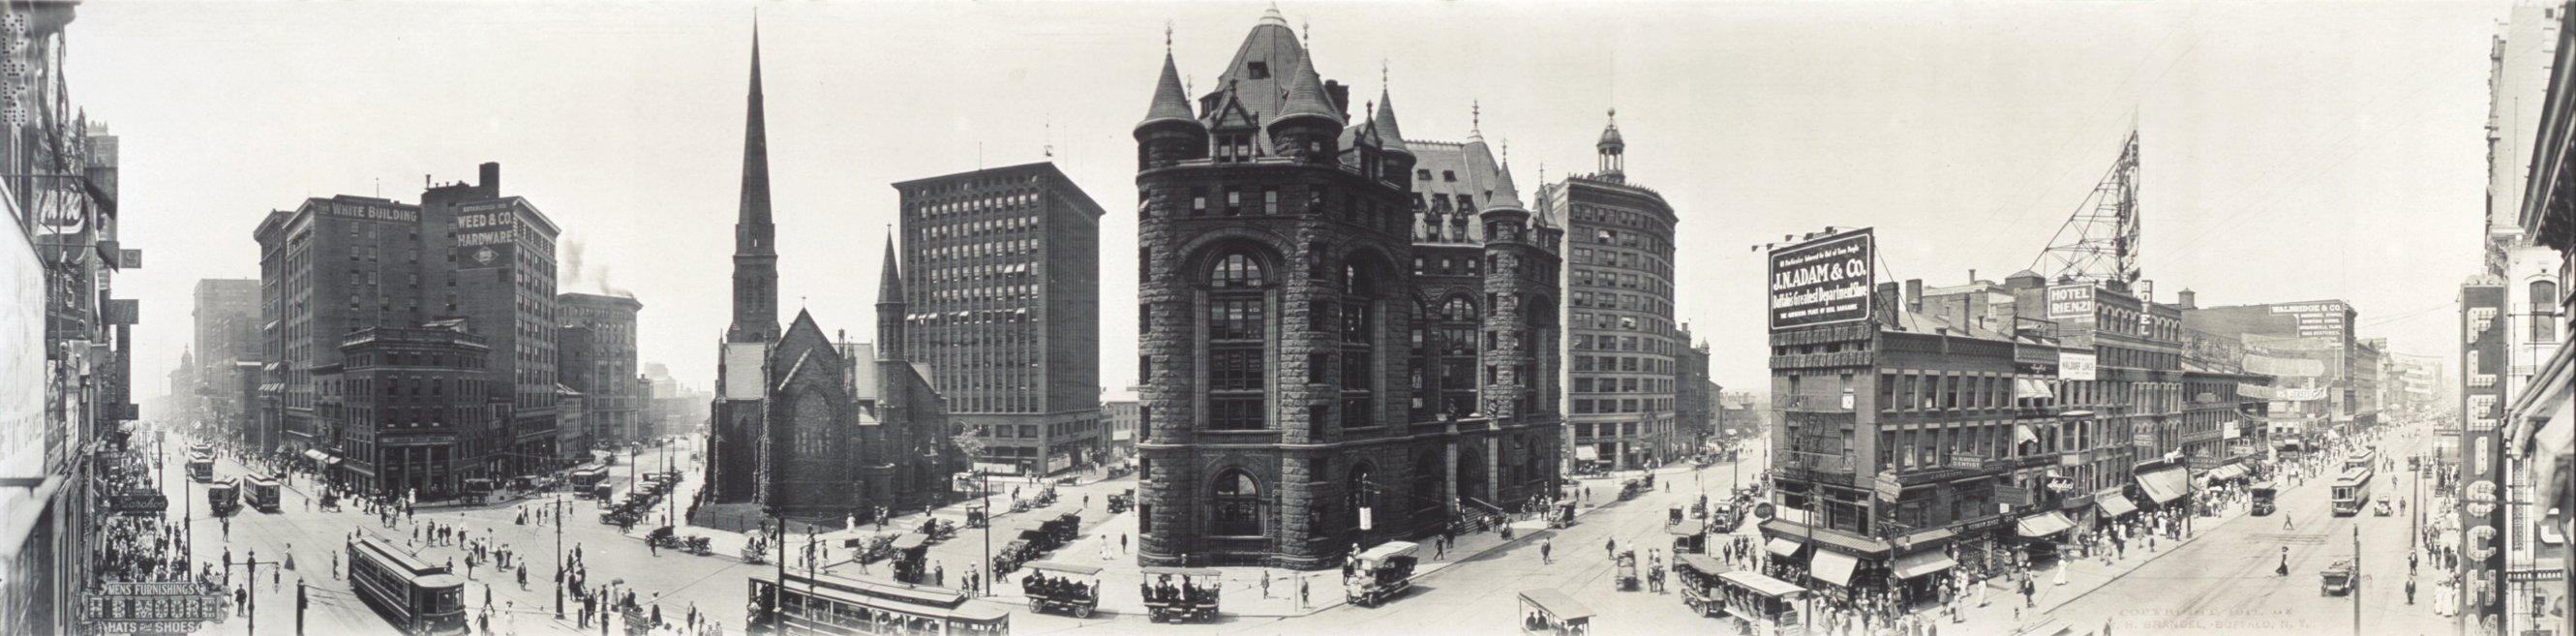 Buffalo_Panorama_1911